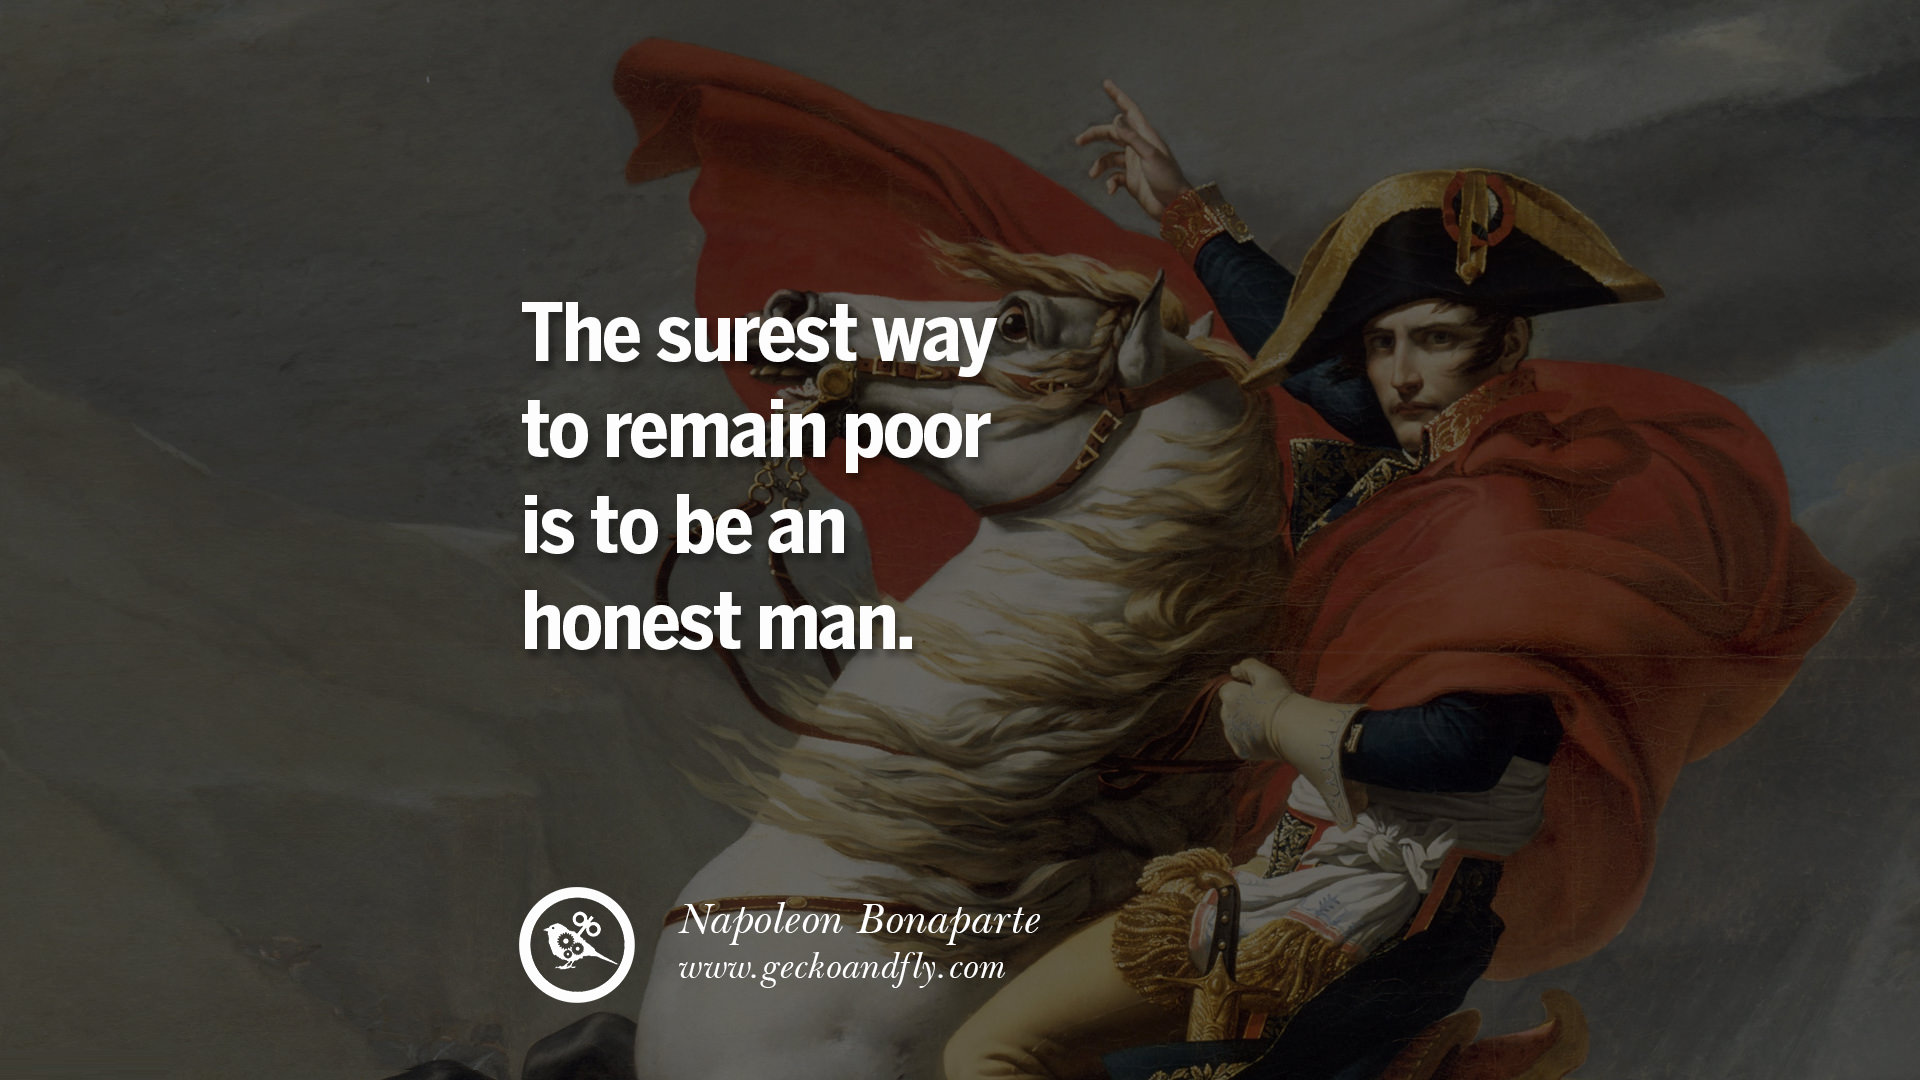 40 Napoleon Bonaparte Quotes On War, Religion, Politics